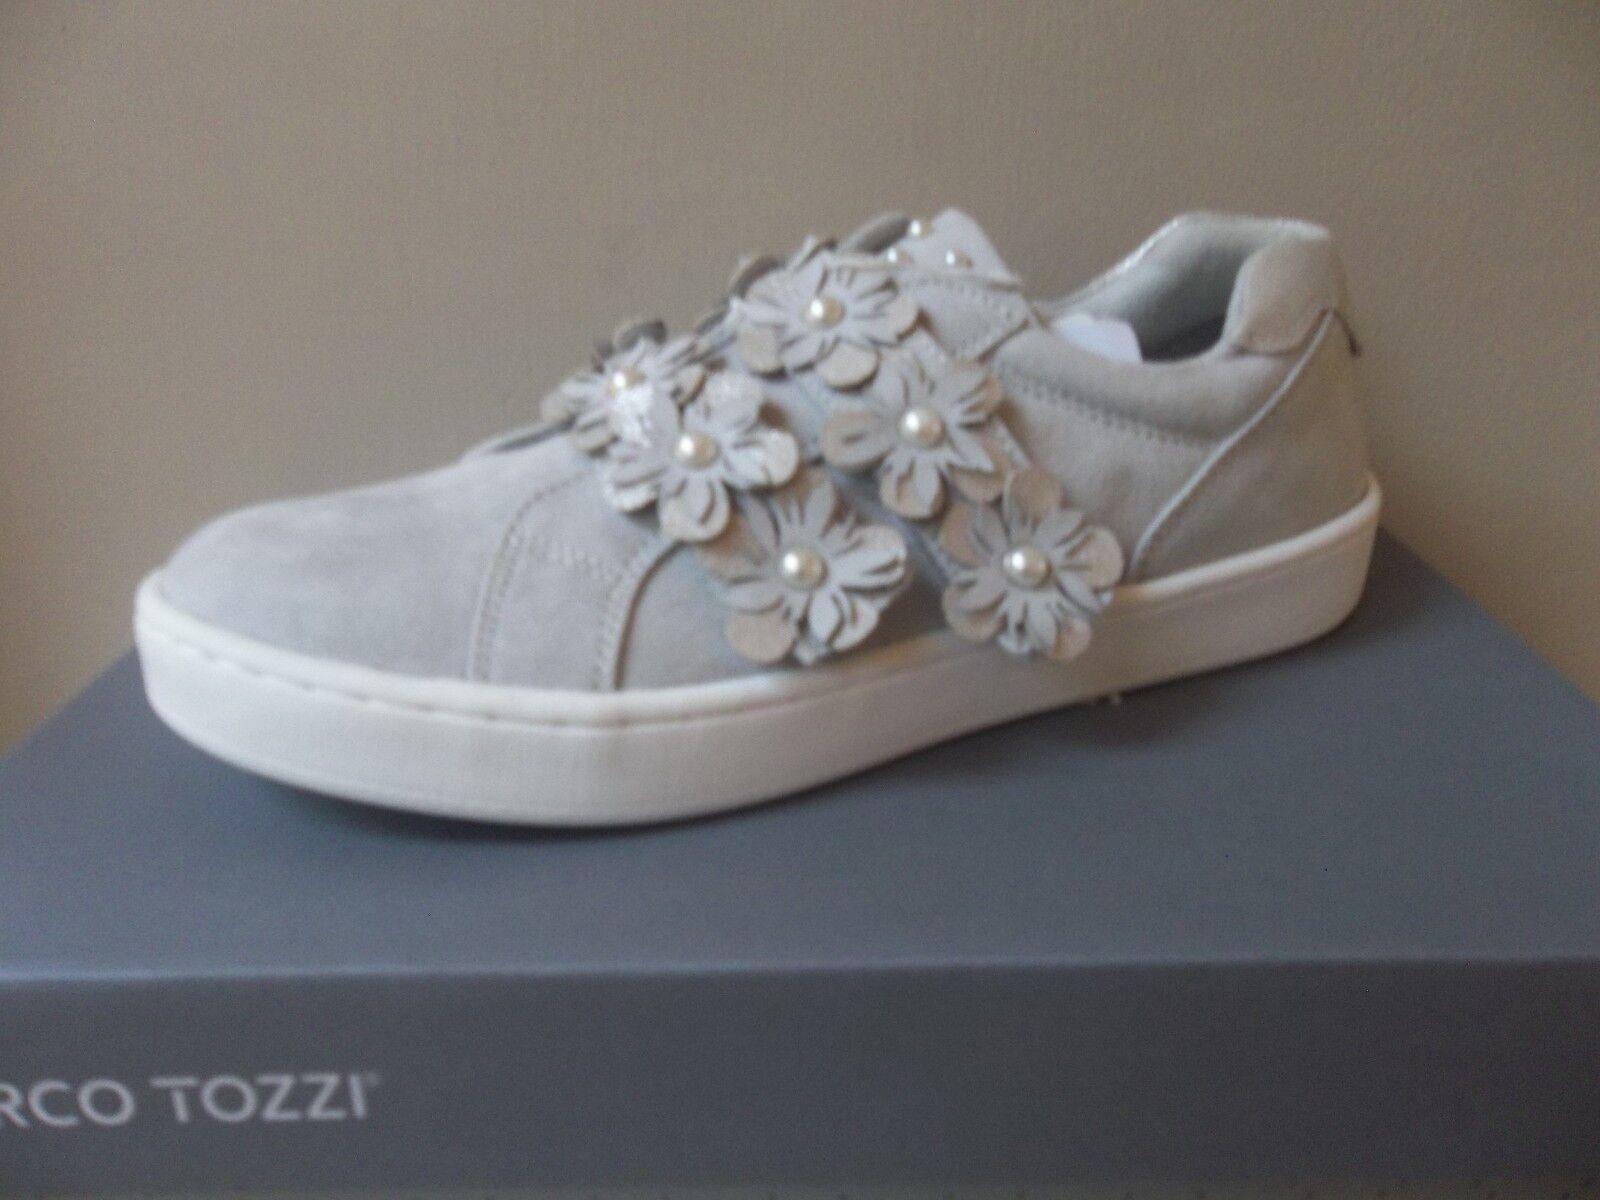 Marco Tozzi gris suede embellished trainer style flats, UK 6 EU 39,  BNWB